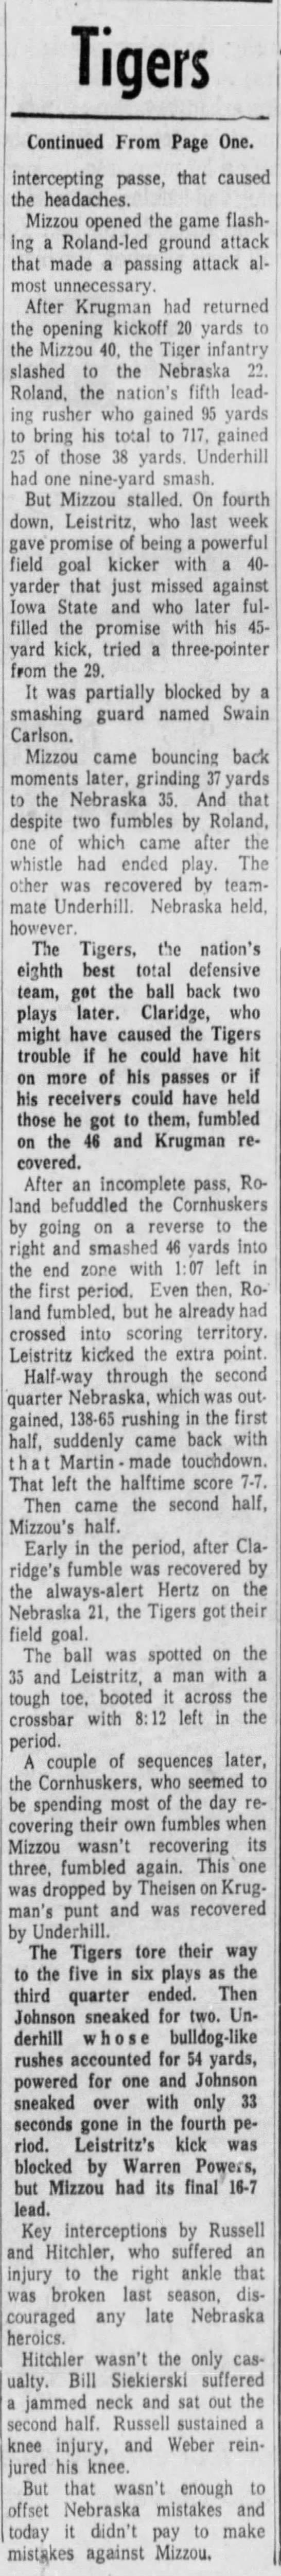 1962 Nebraska-Missouri part 2 St. Louis -